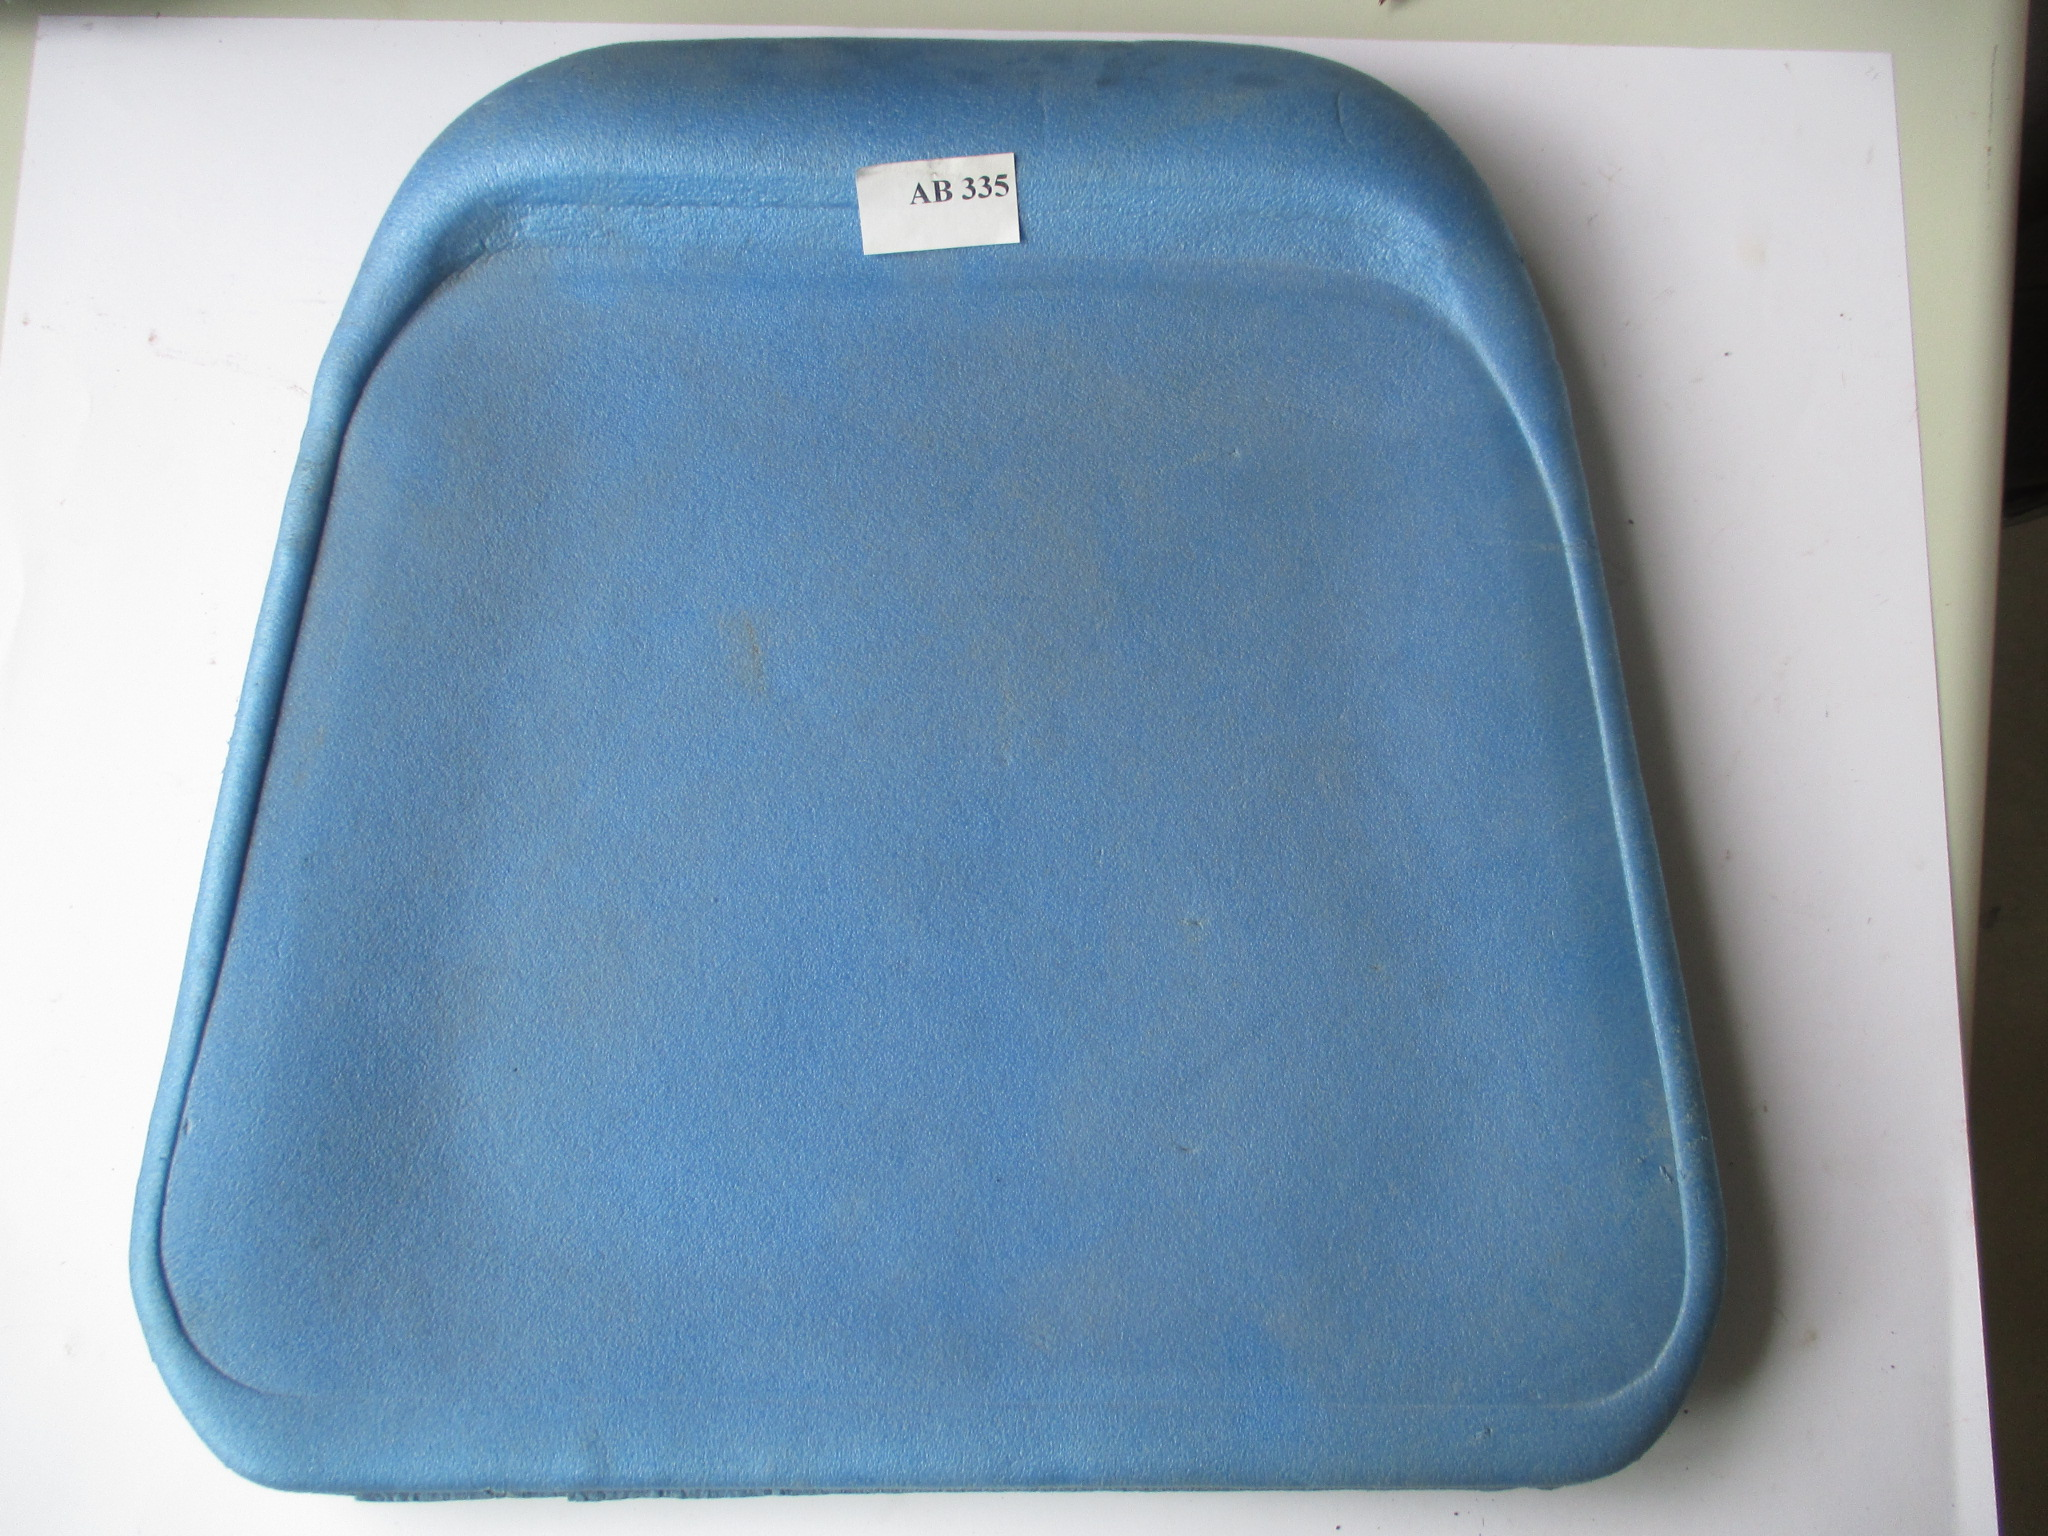 Asiento de poliuretano azul